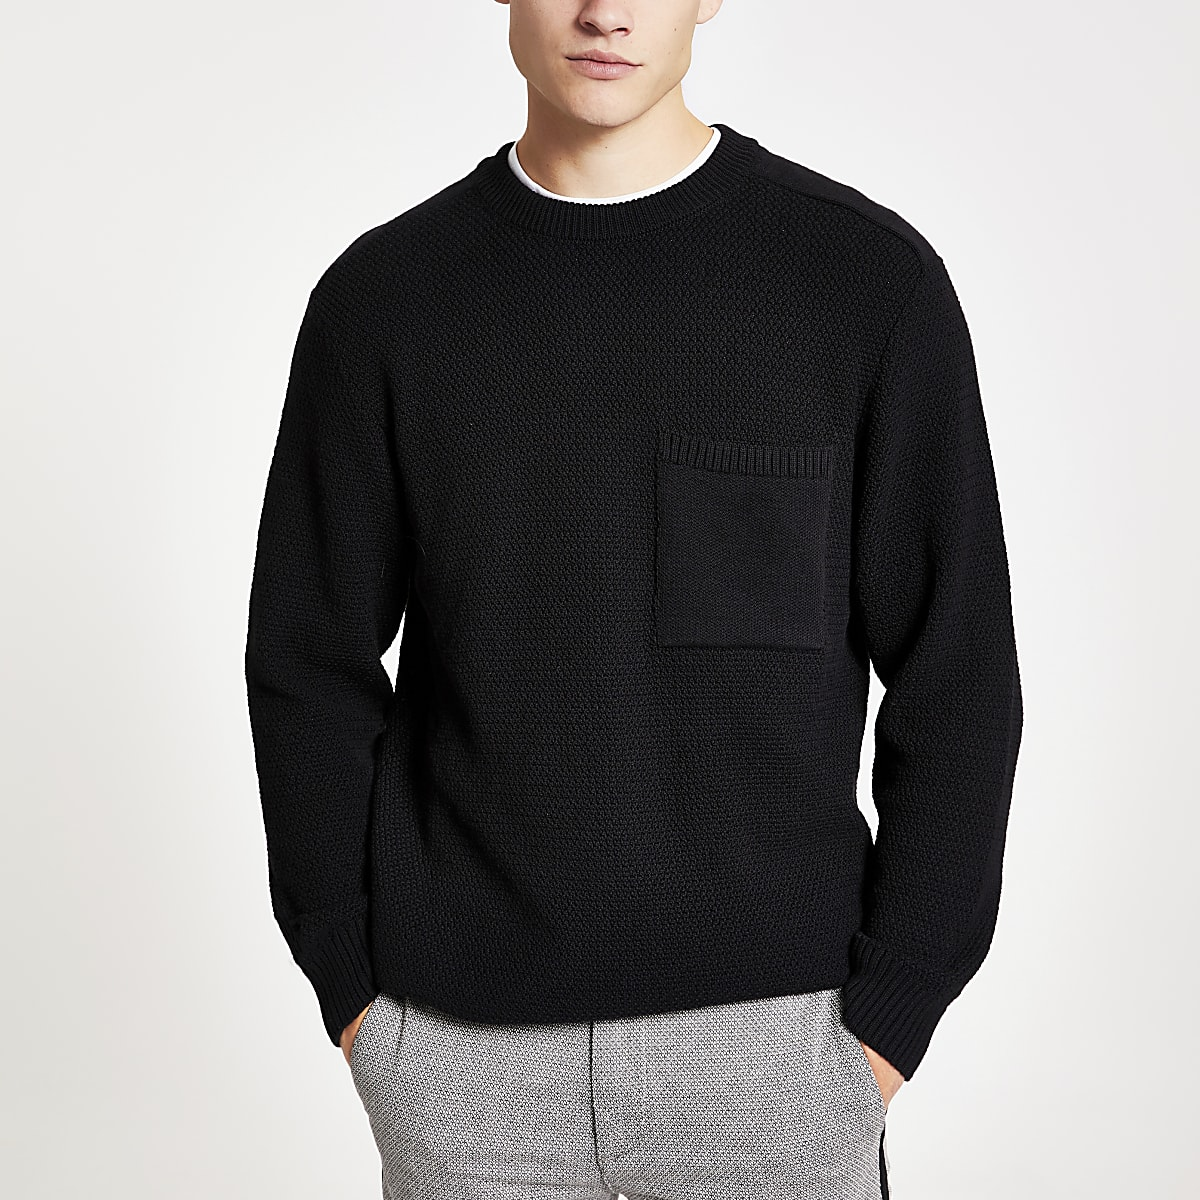 Black textured knit regular fit jumper